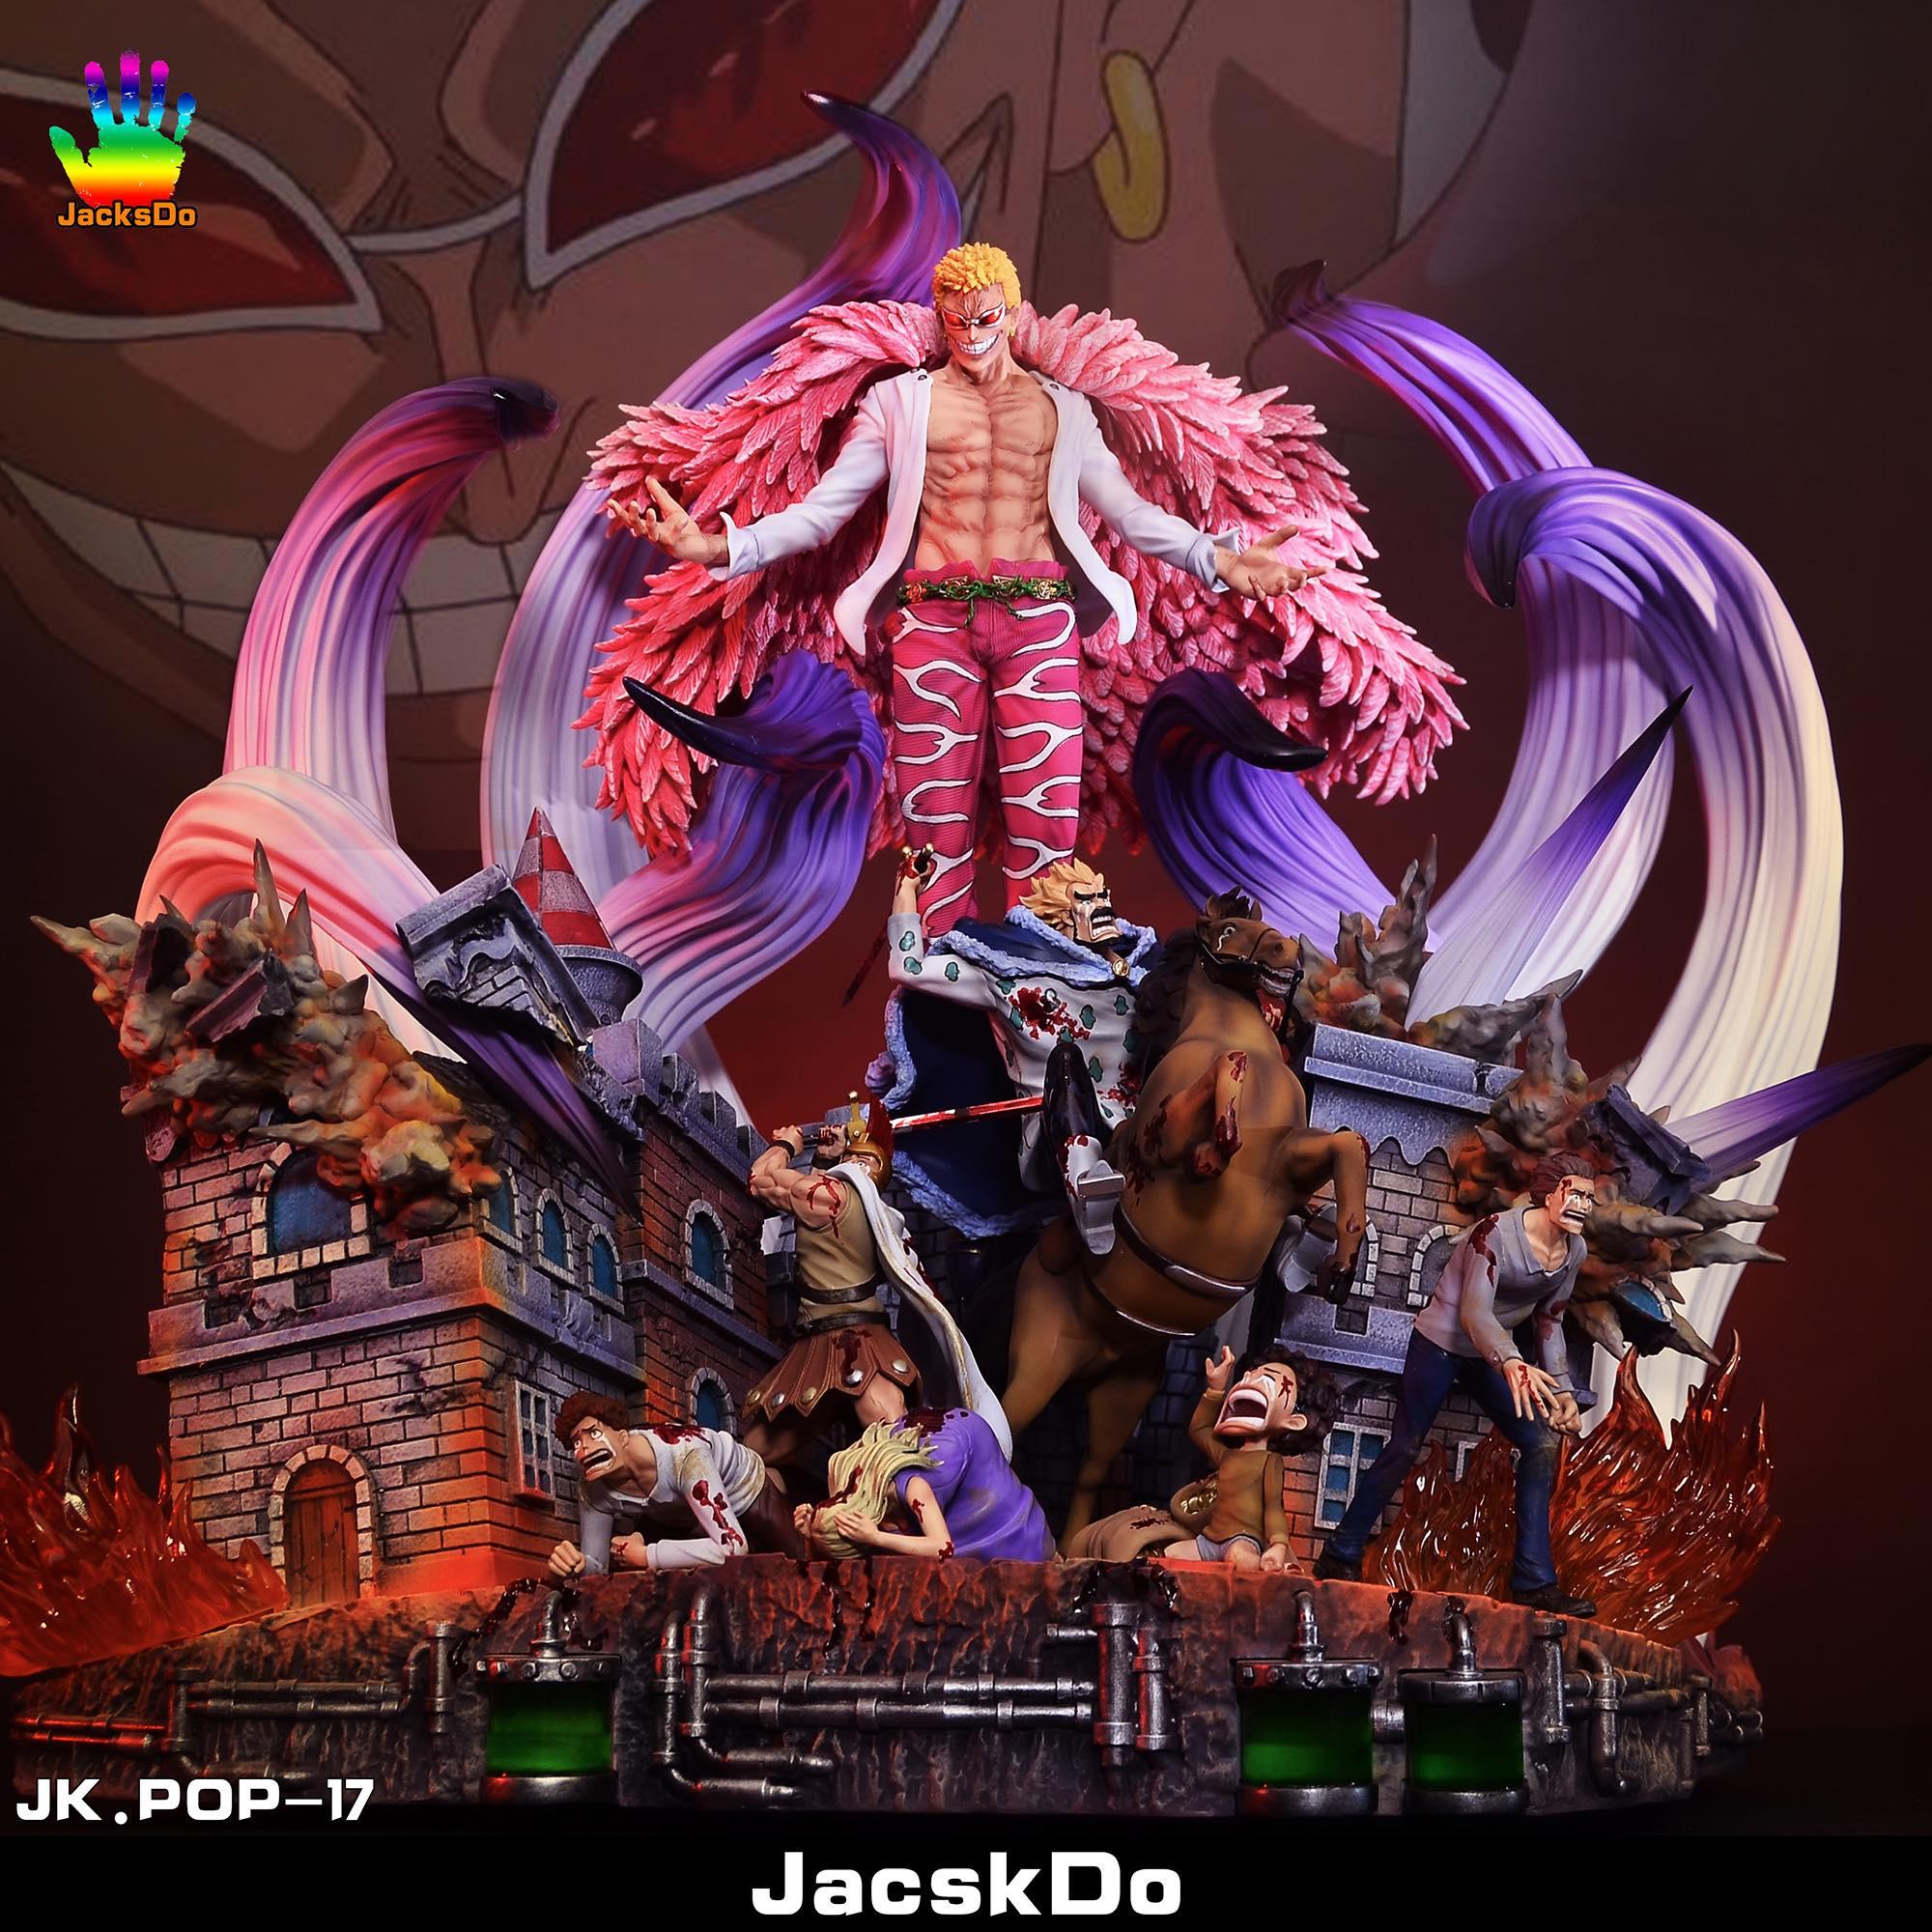 Doflamingo Jacksdo Studio